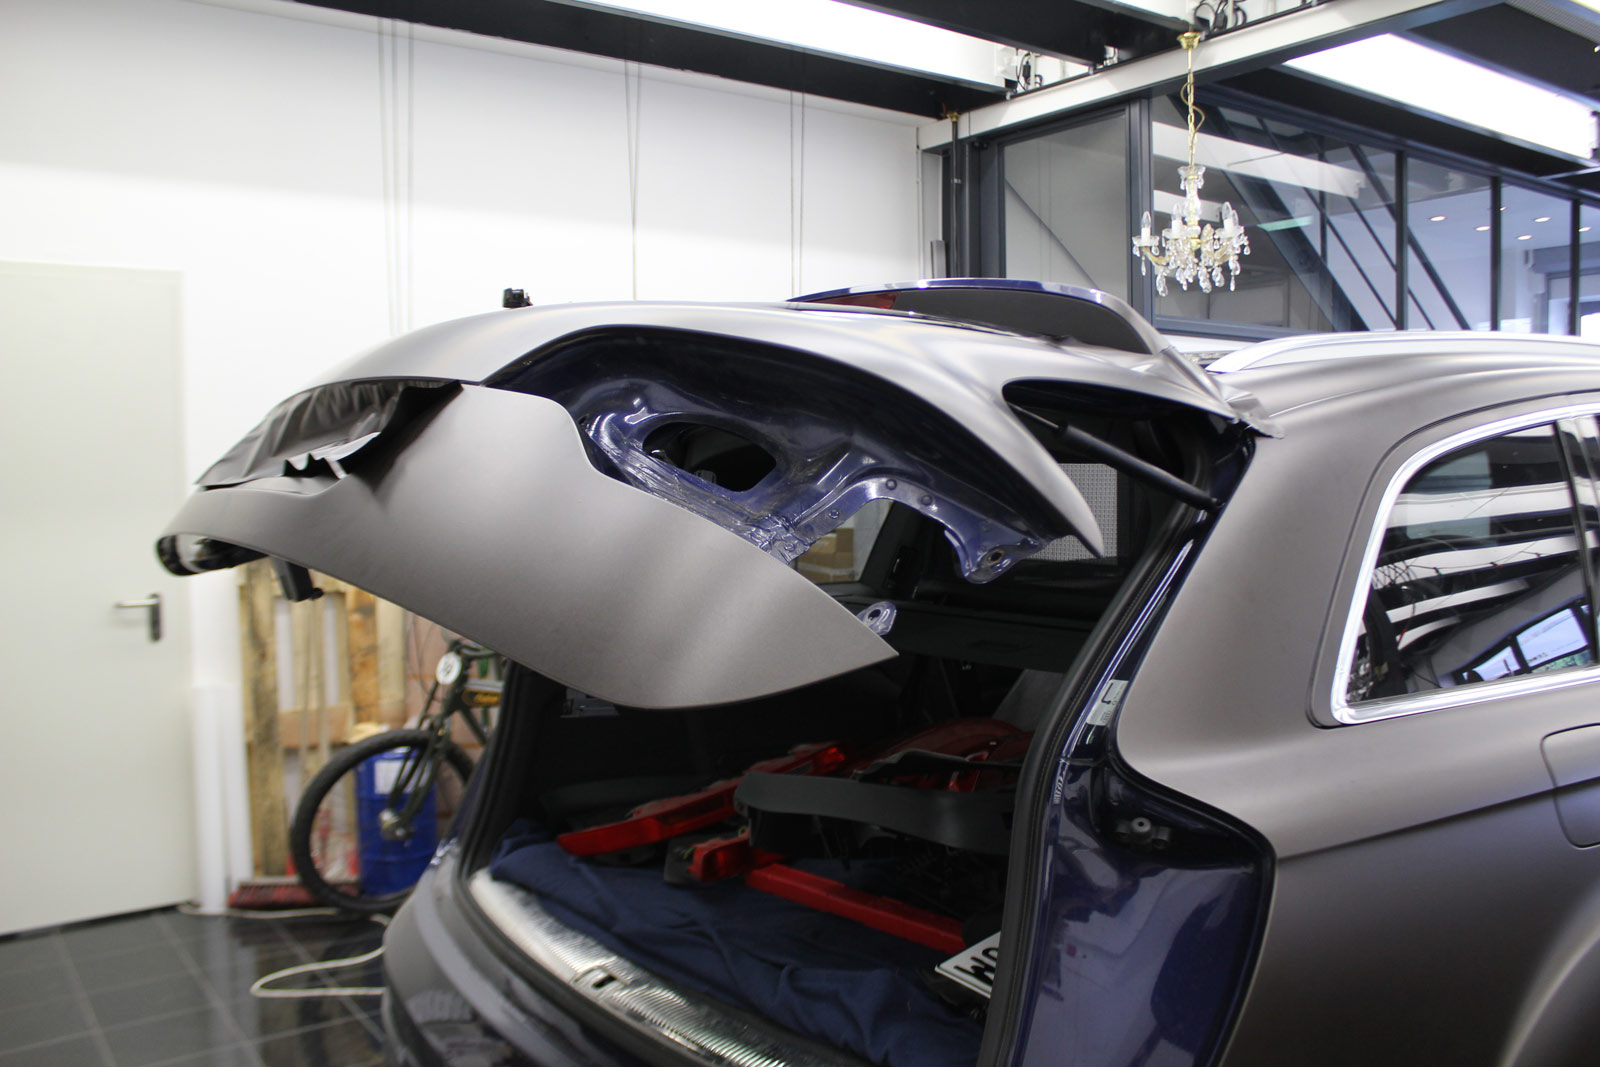 Audi_Q7_Folierung_Braun_Matt_Metallic_01